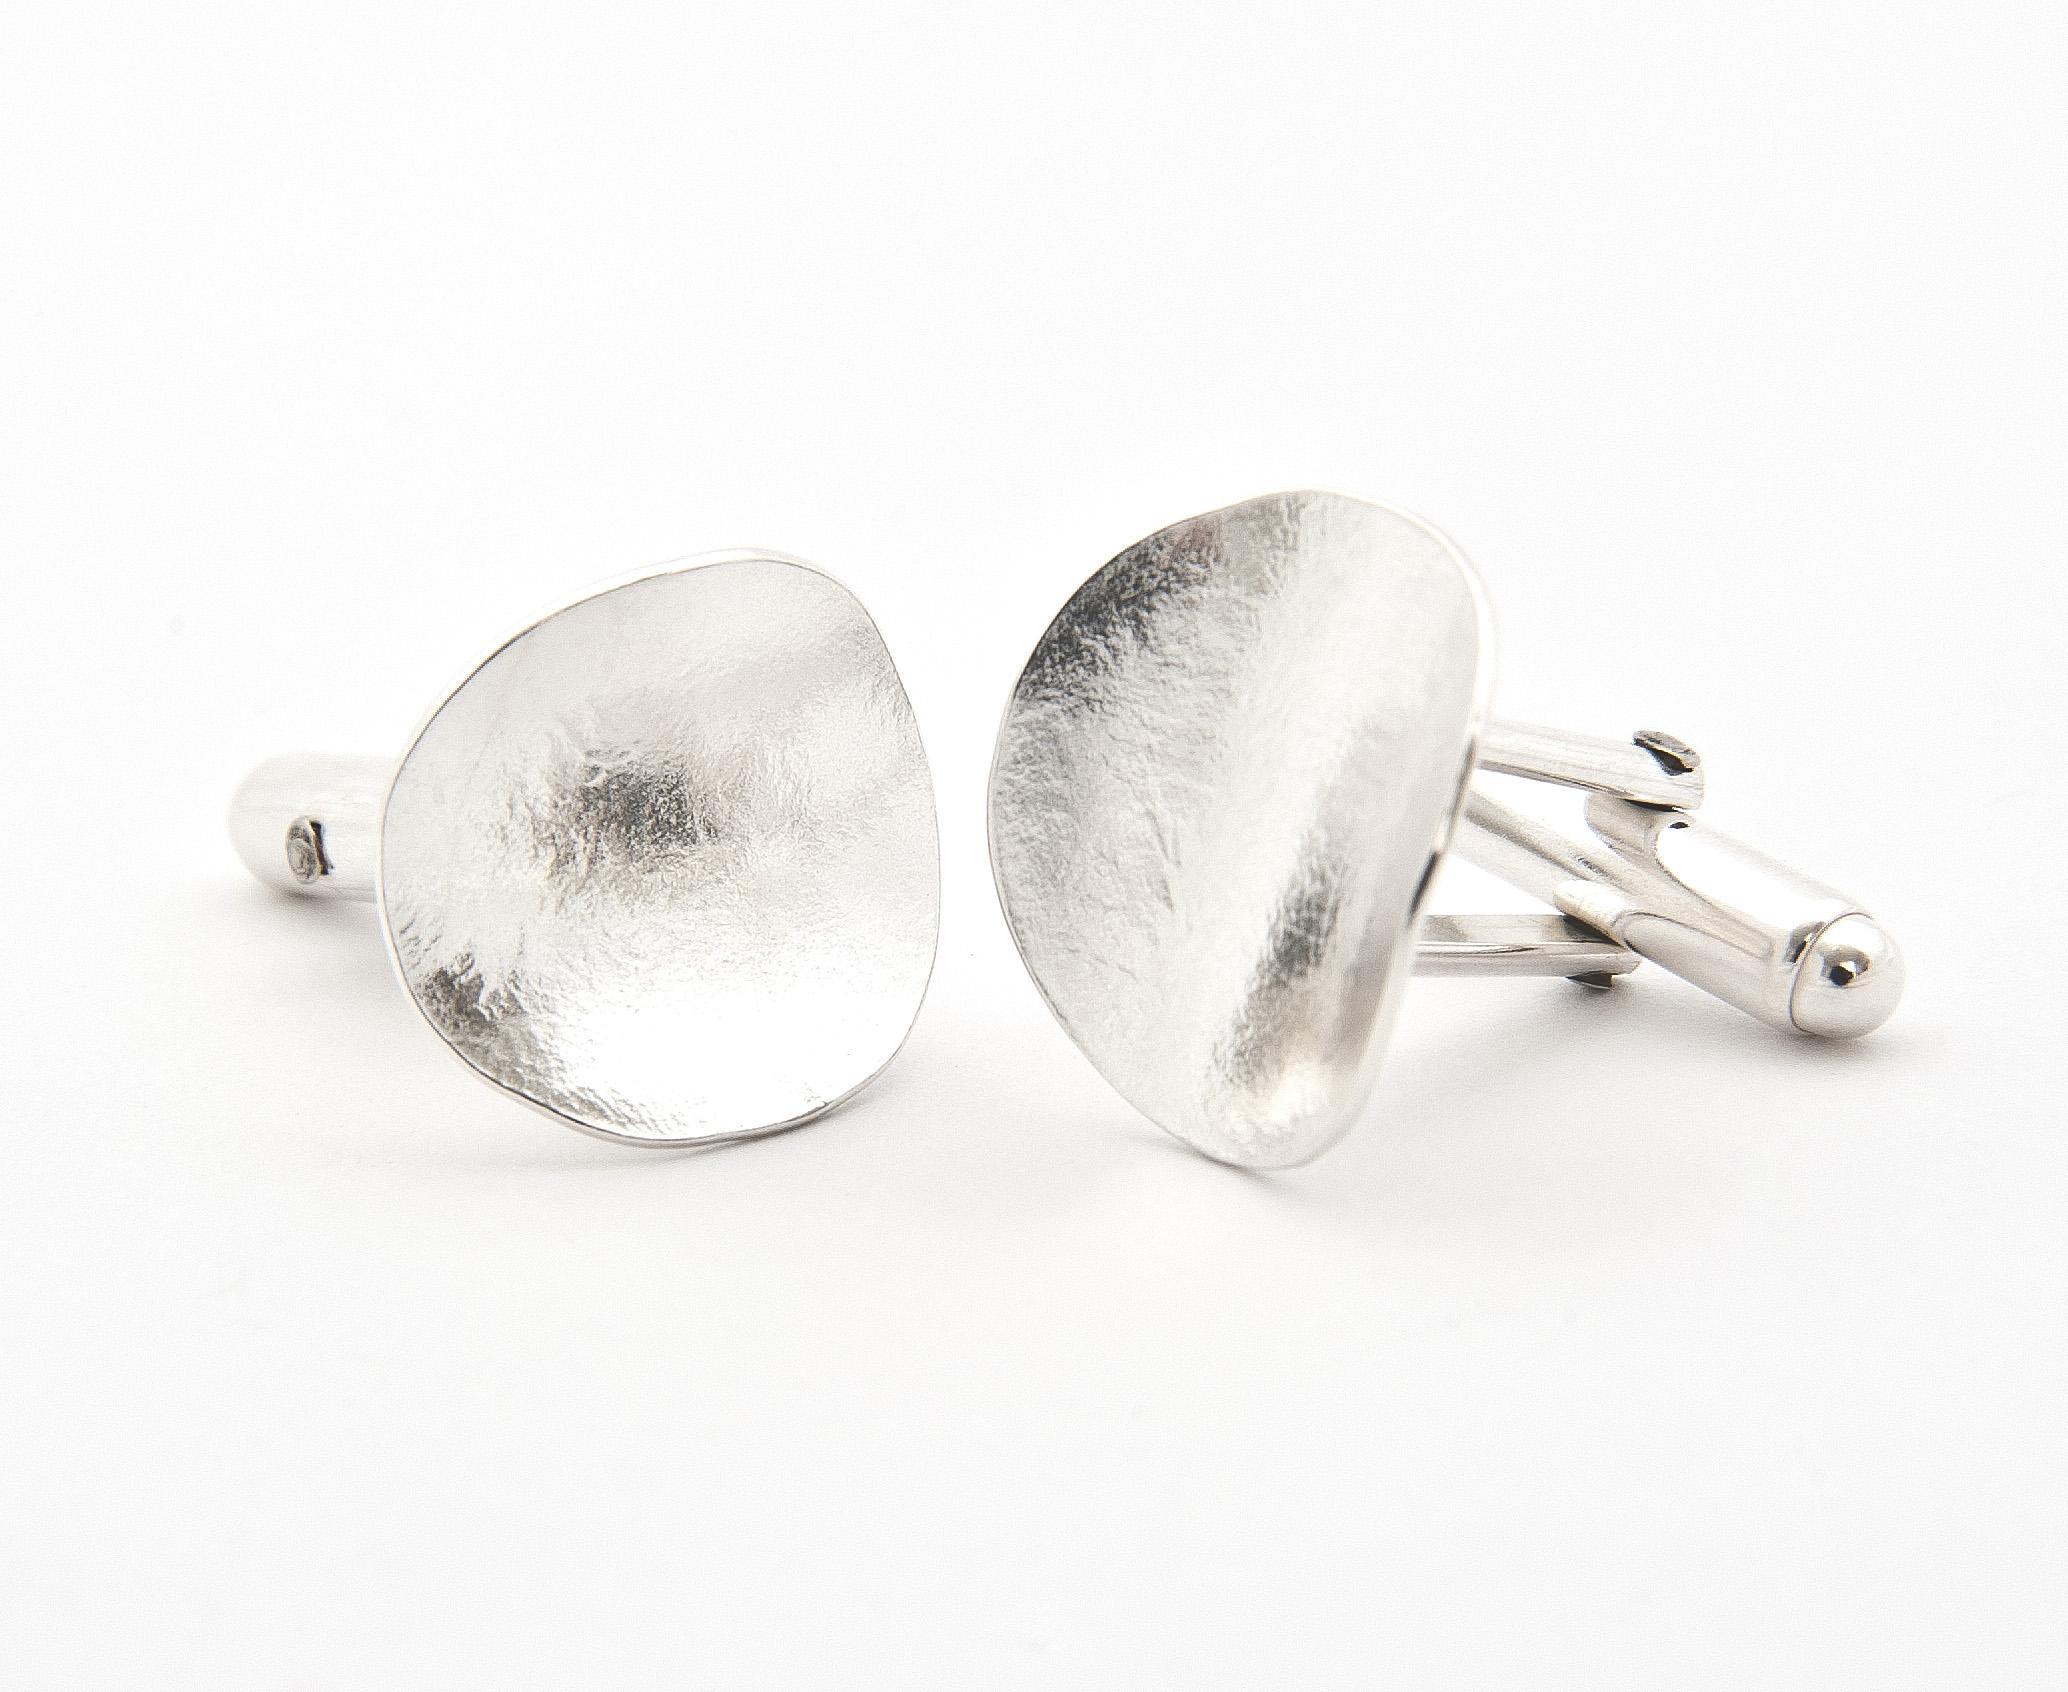 honesty-cufflinks-hand-made-silver-lathamamneve.jpg